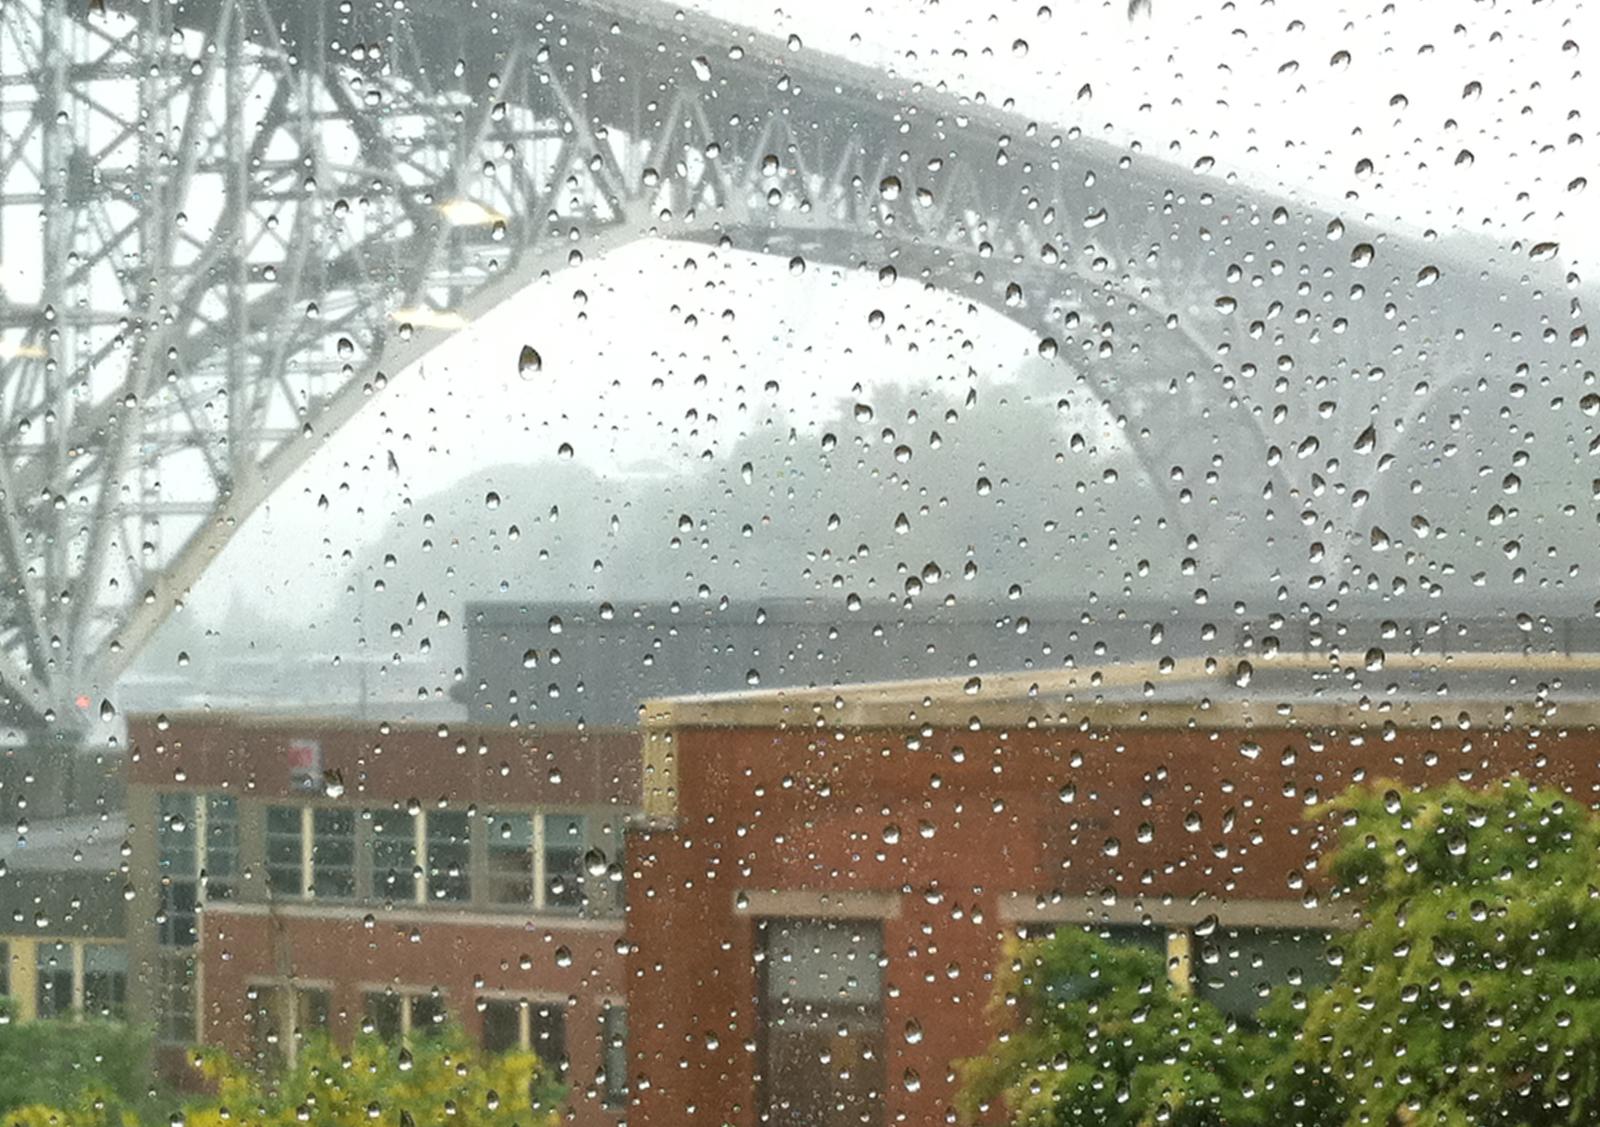 Looking out at Aurora Bridge during rainstorm. Photo © Heather Van Steenburgh.